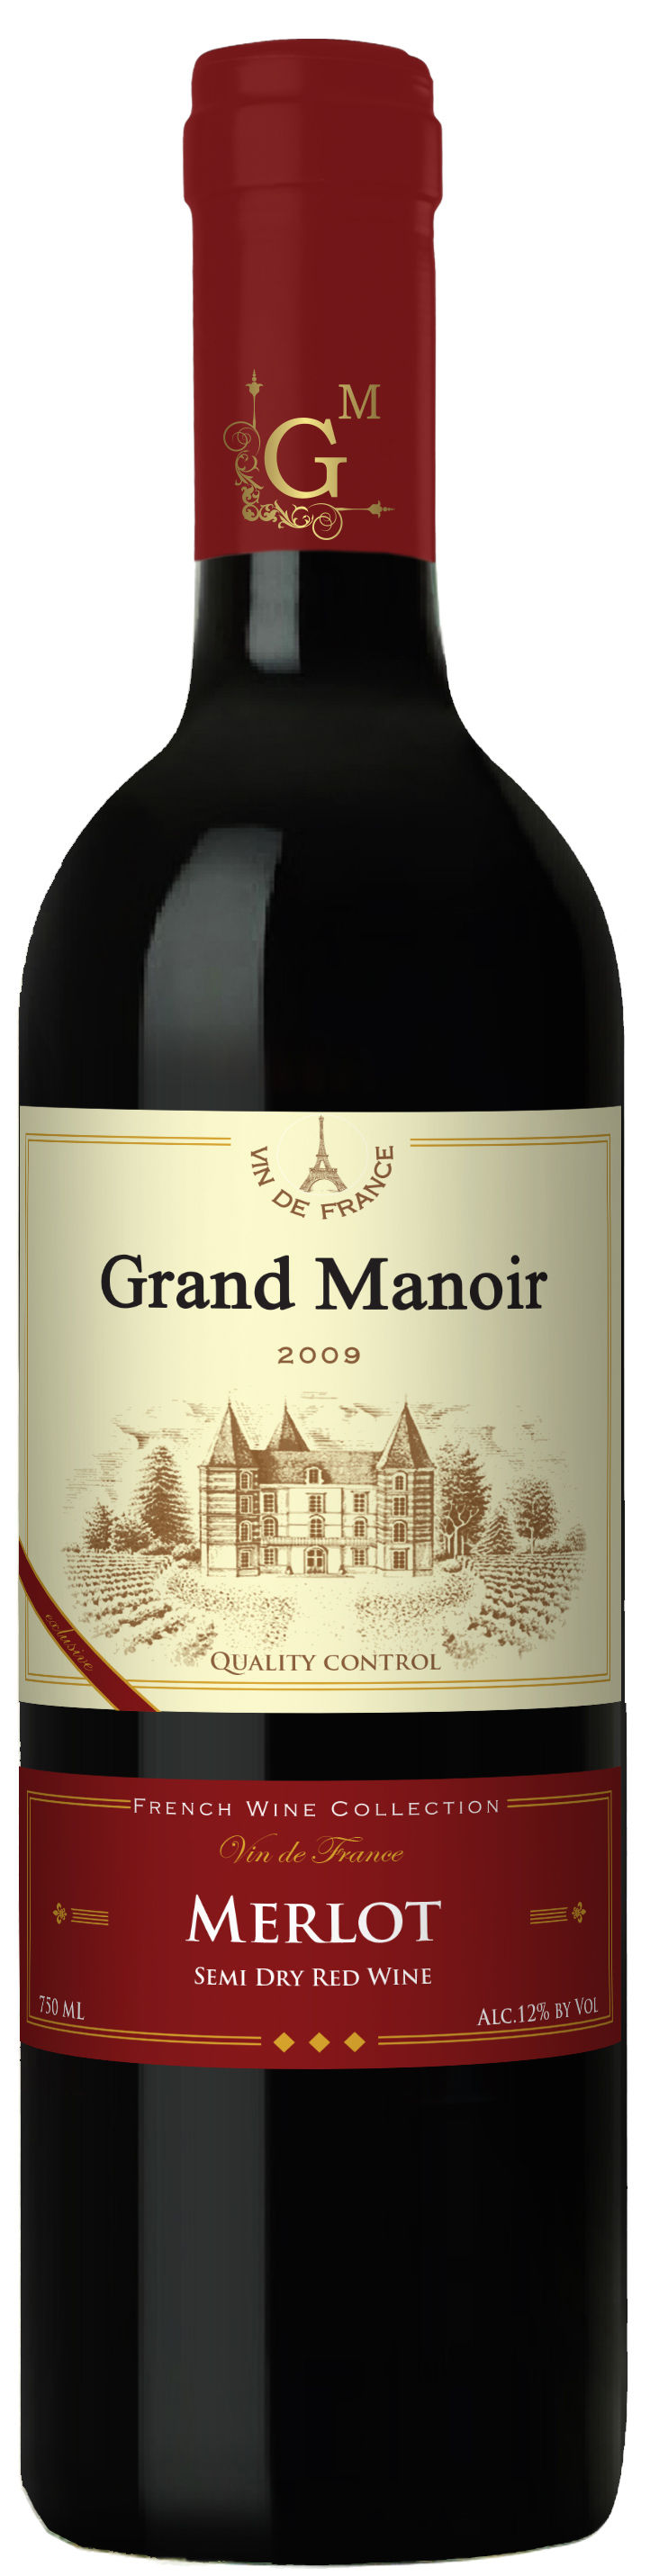 Grand Manoir Merlot semi dry